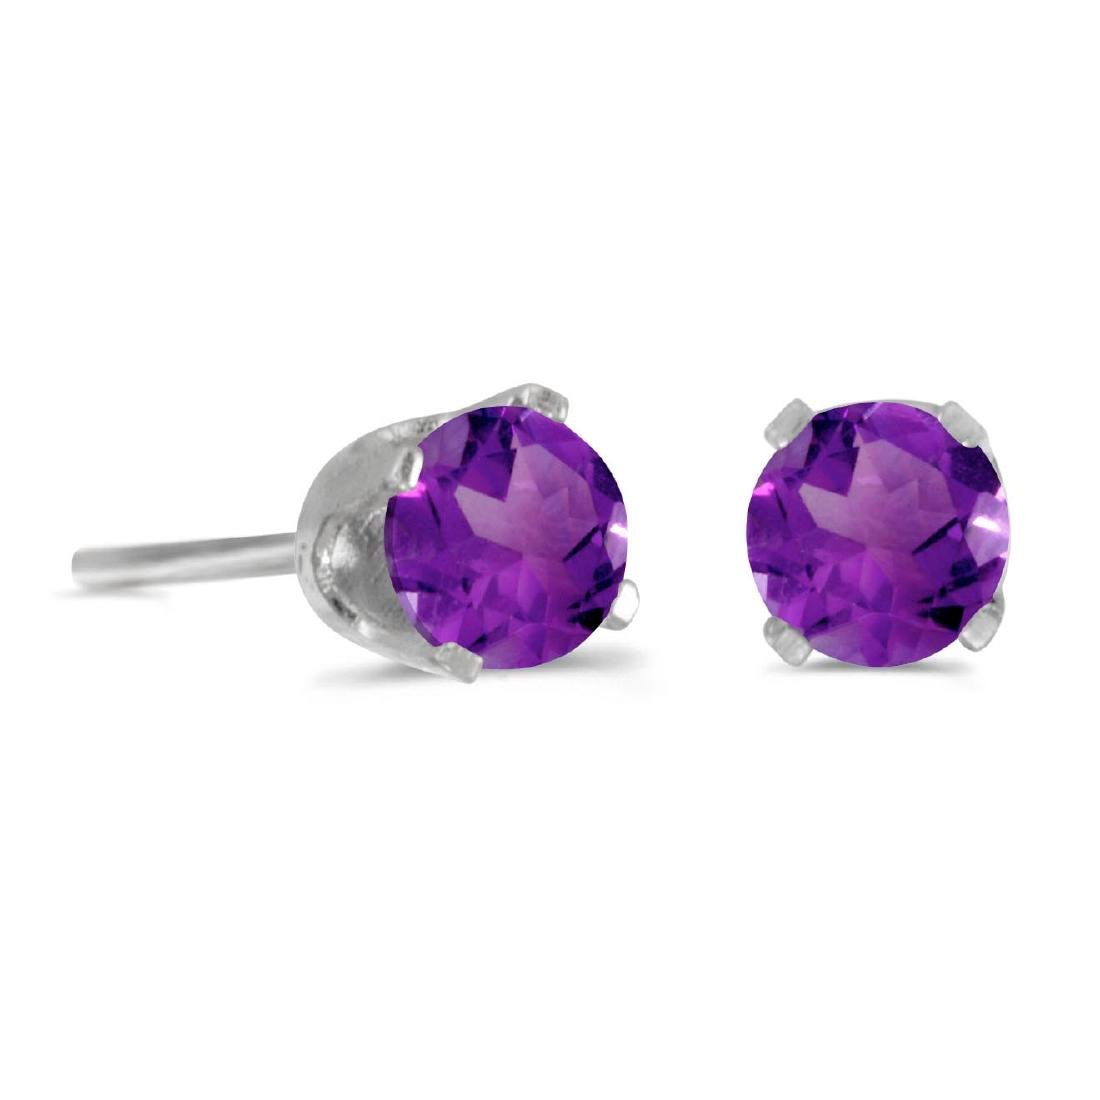 Certified 4 mm Round Amethyst Screw-back Stud Earrings